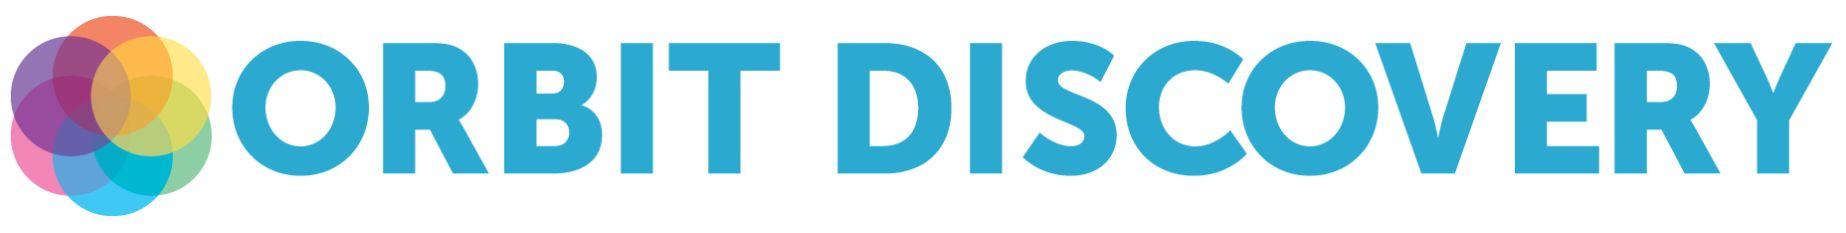 Orbit Discovery logo